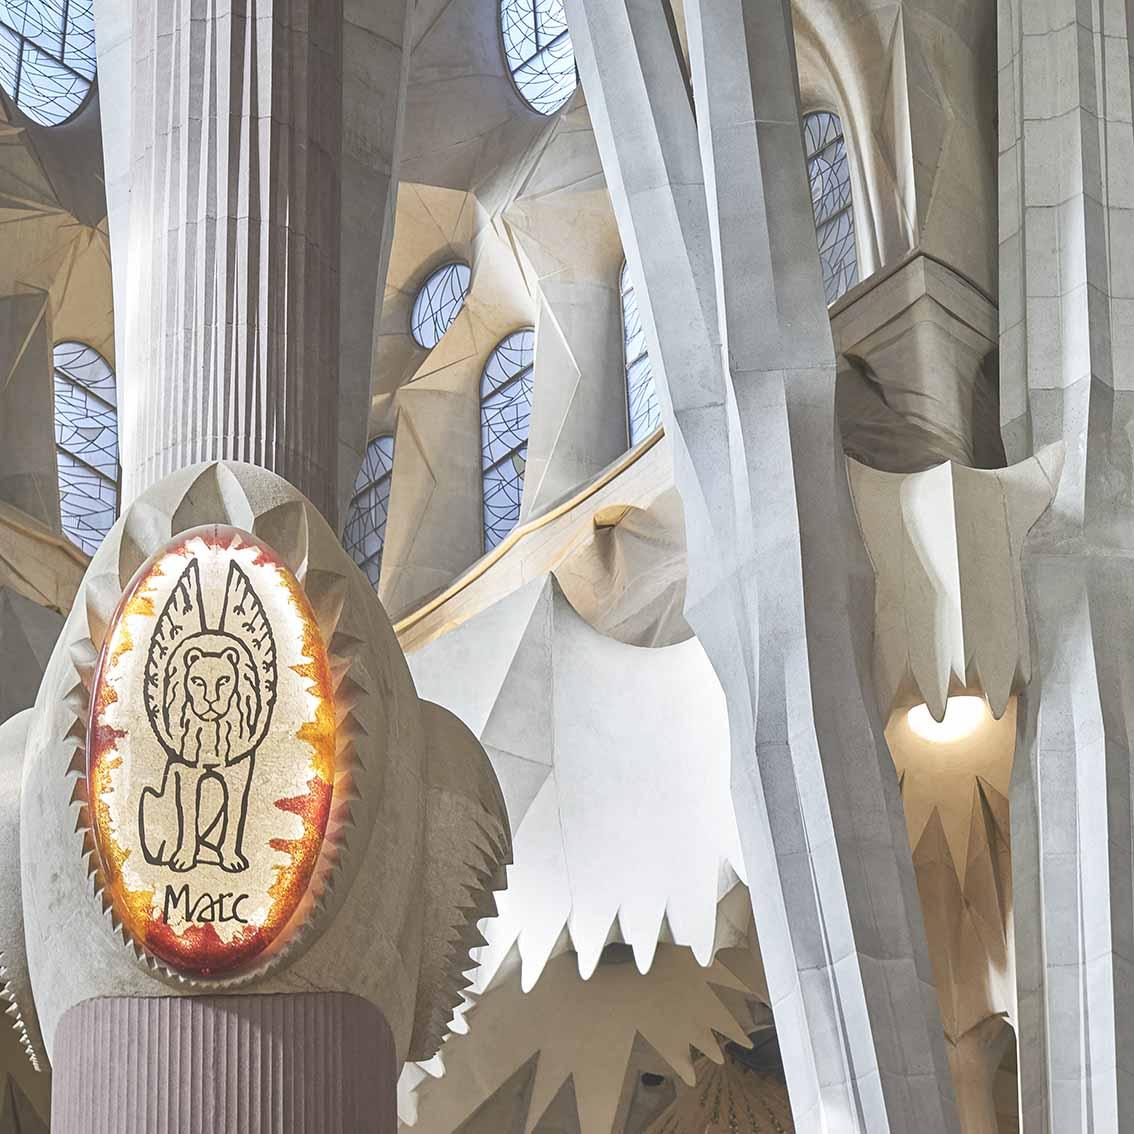 Pour-Gaudi-La-Sainte-Famille-6927-1x1